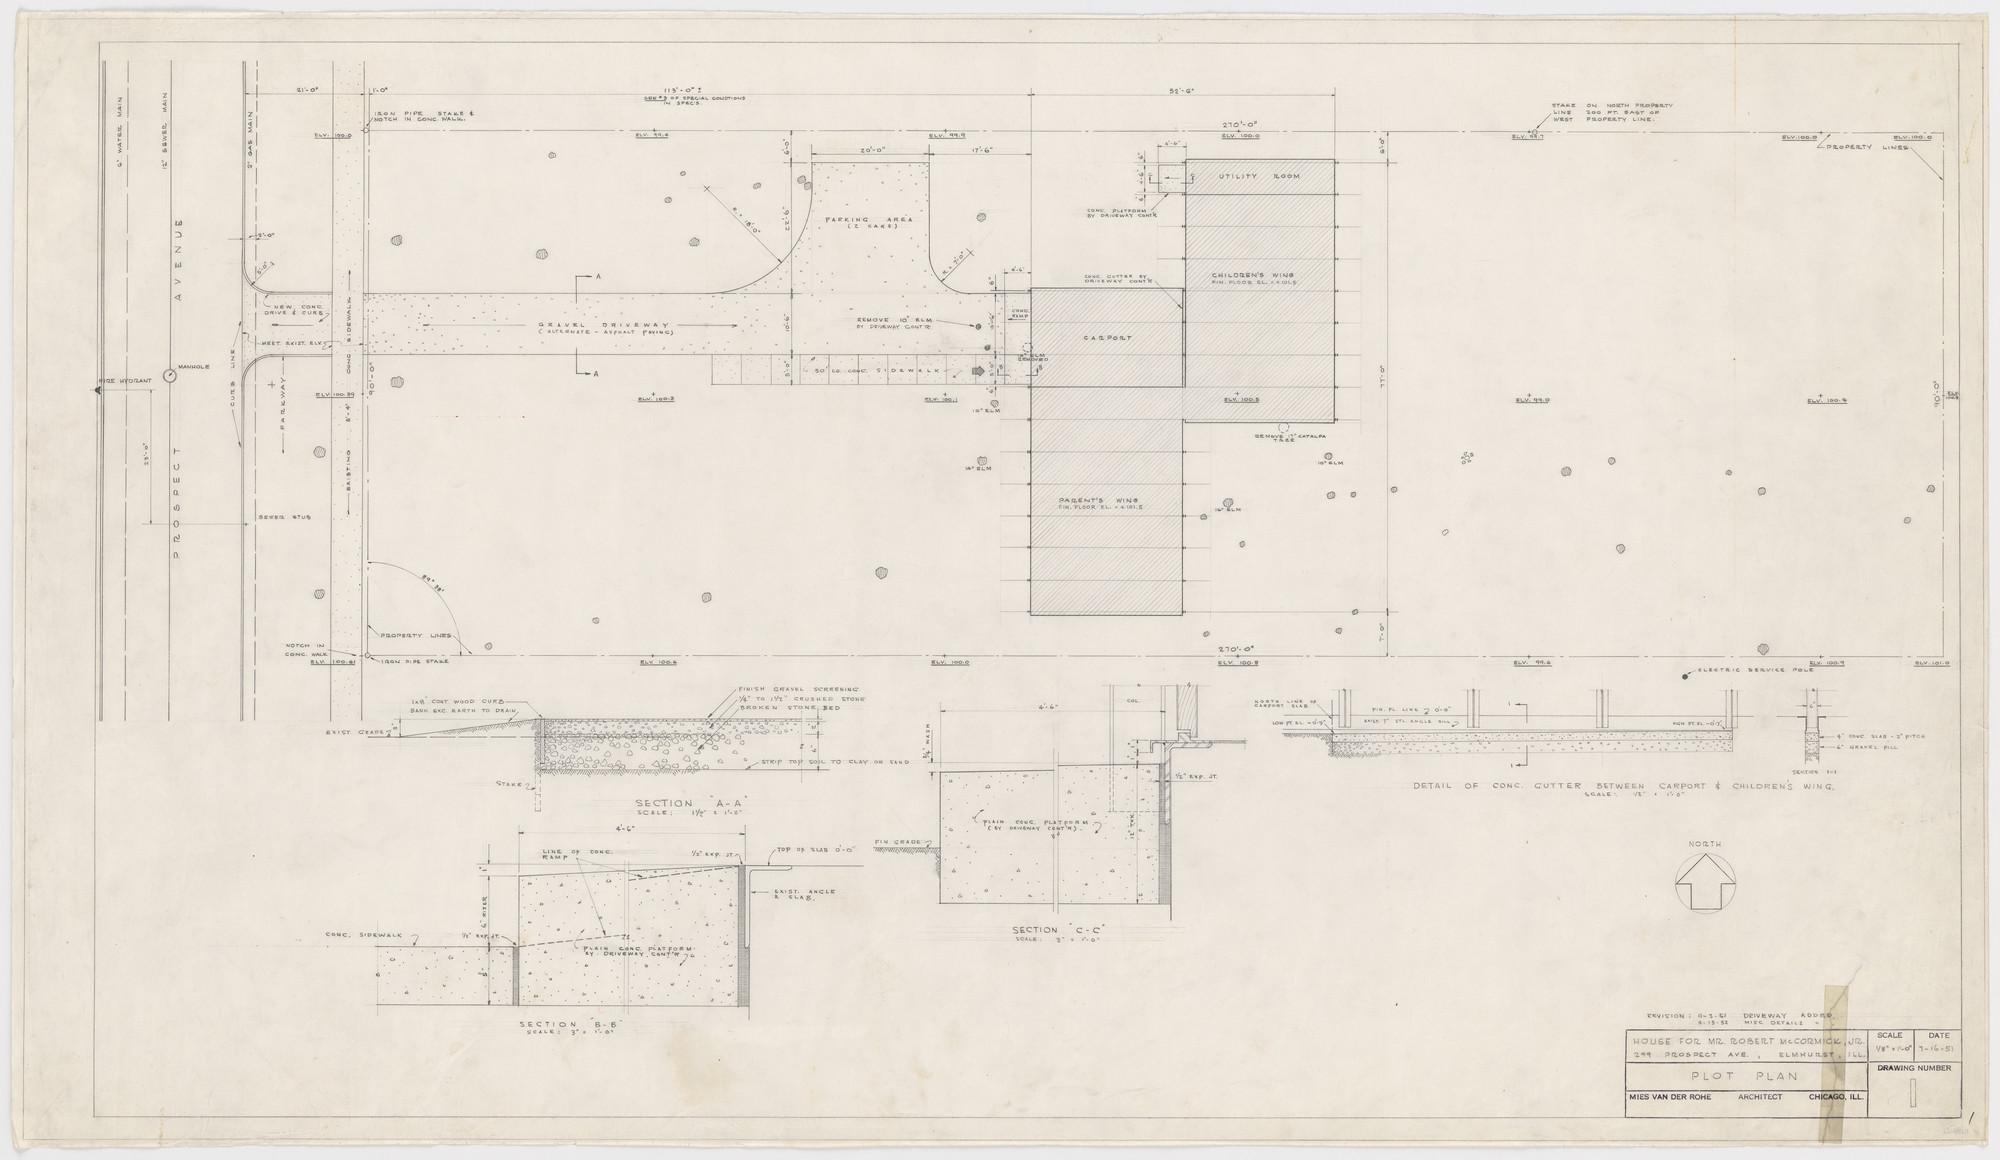 Ludwig Mies van der Rohe. Robert H. McCormick House, Elmhurst, IL ...